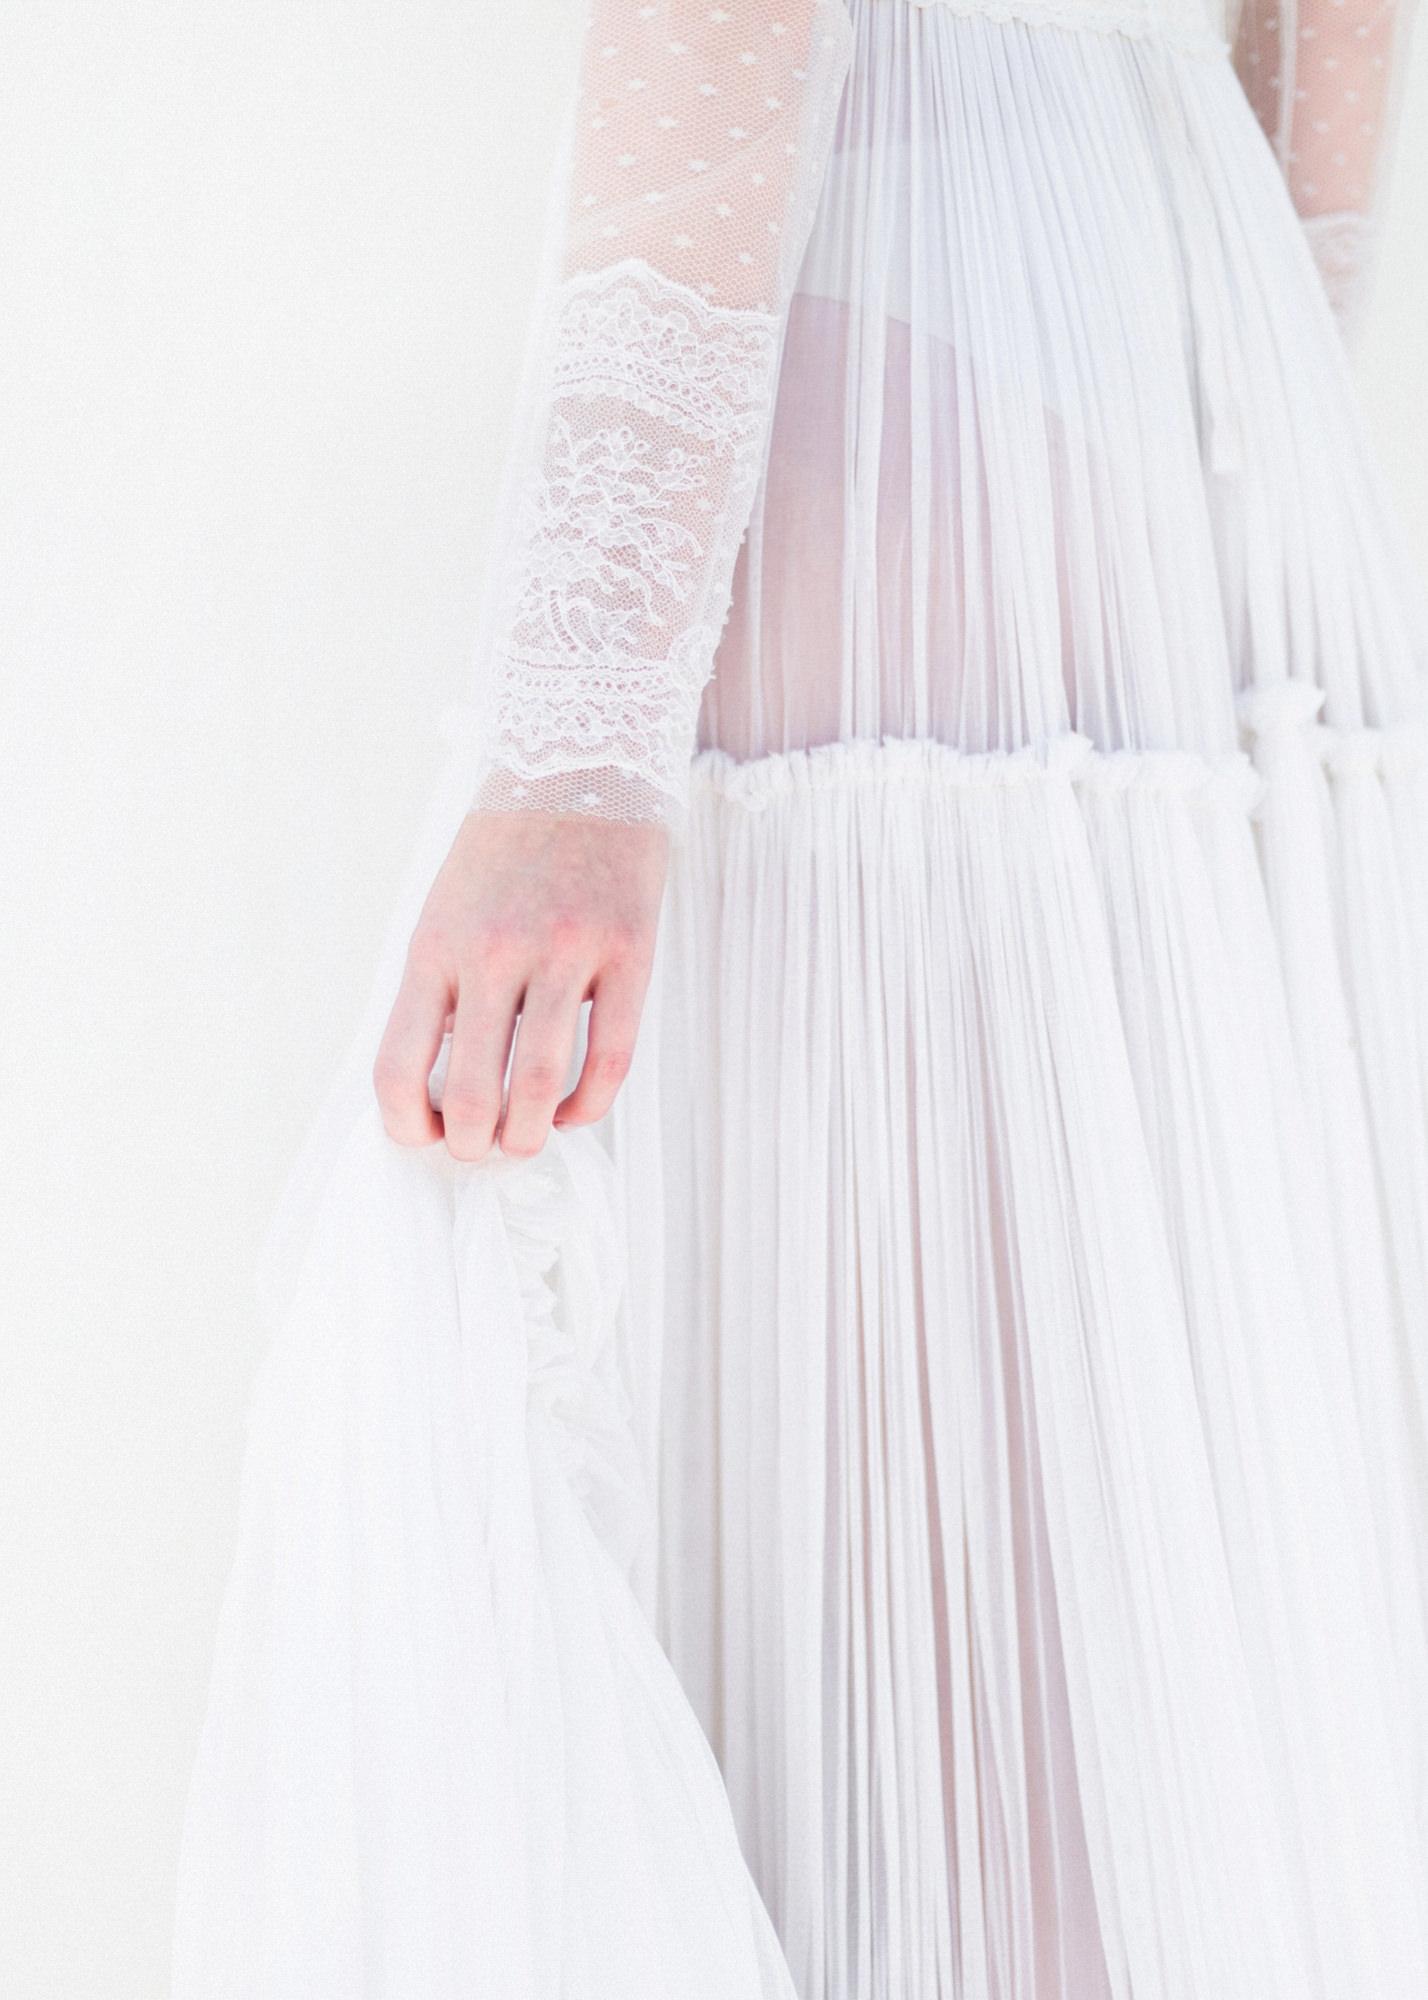 09-portrait-santorini-wedding-photographer-greece-b-v